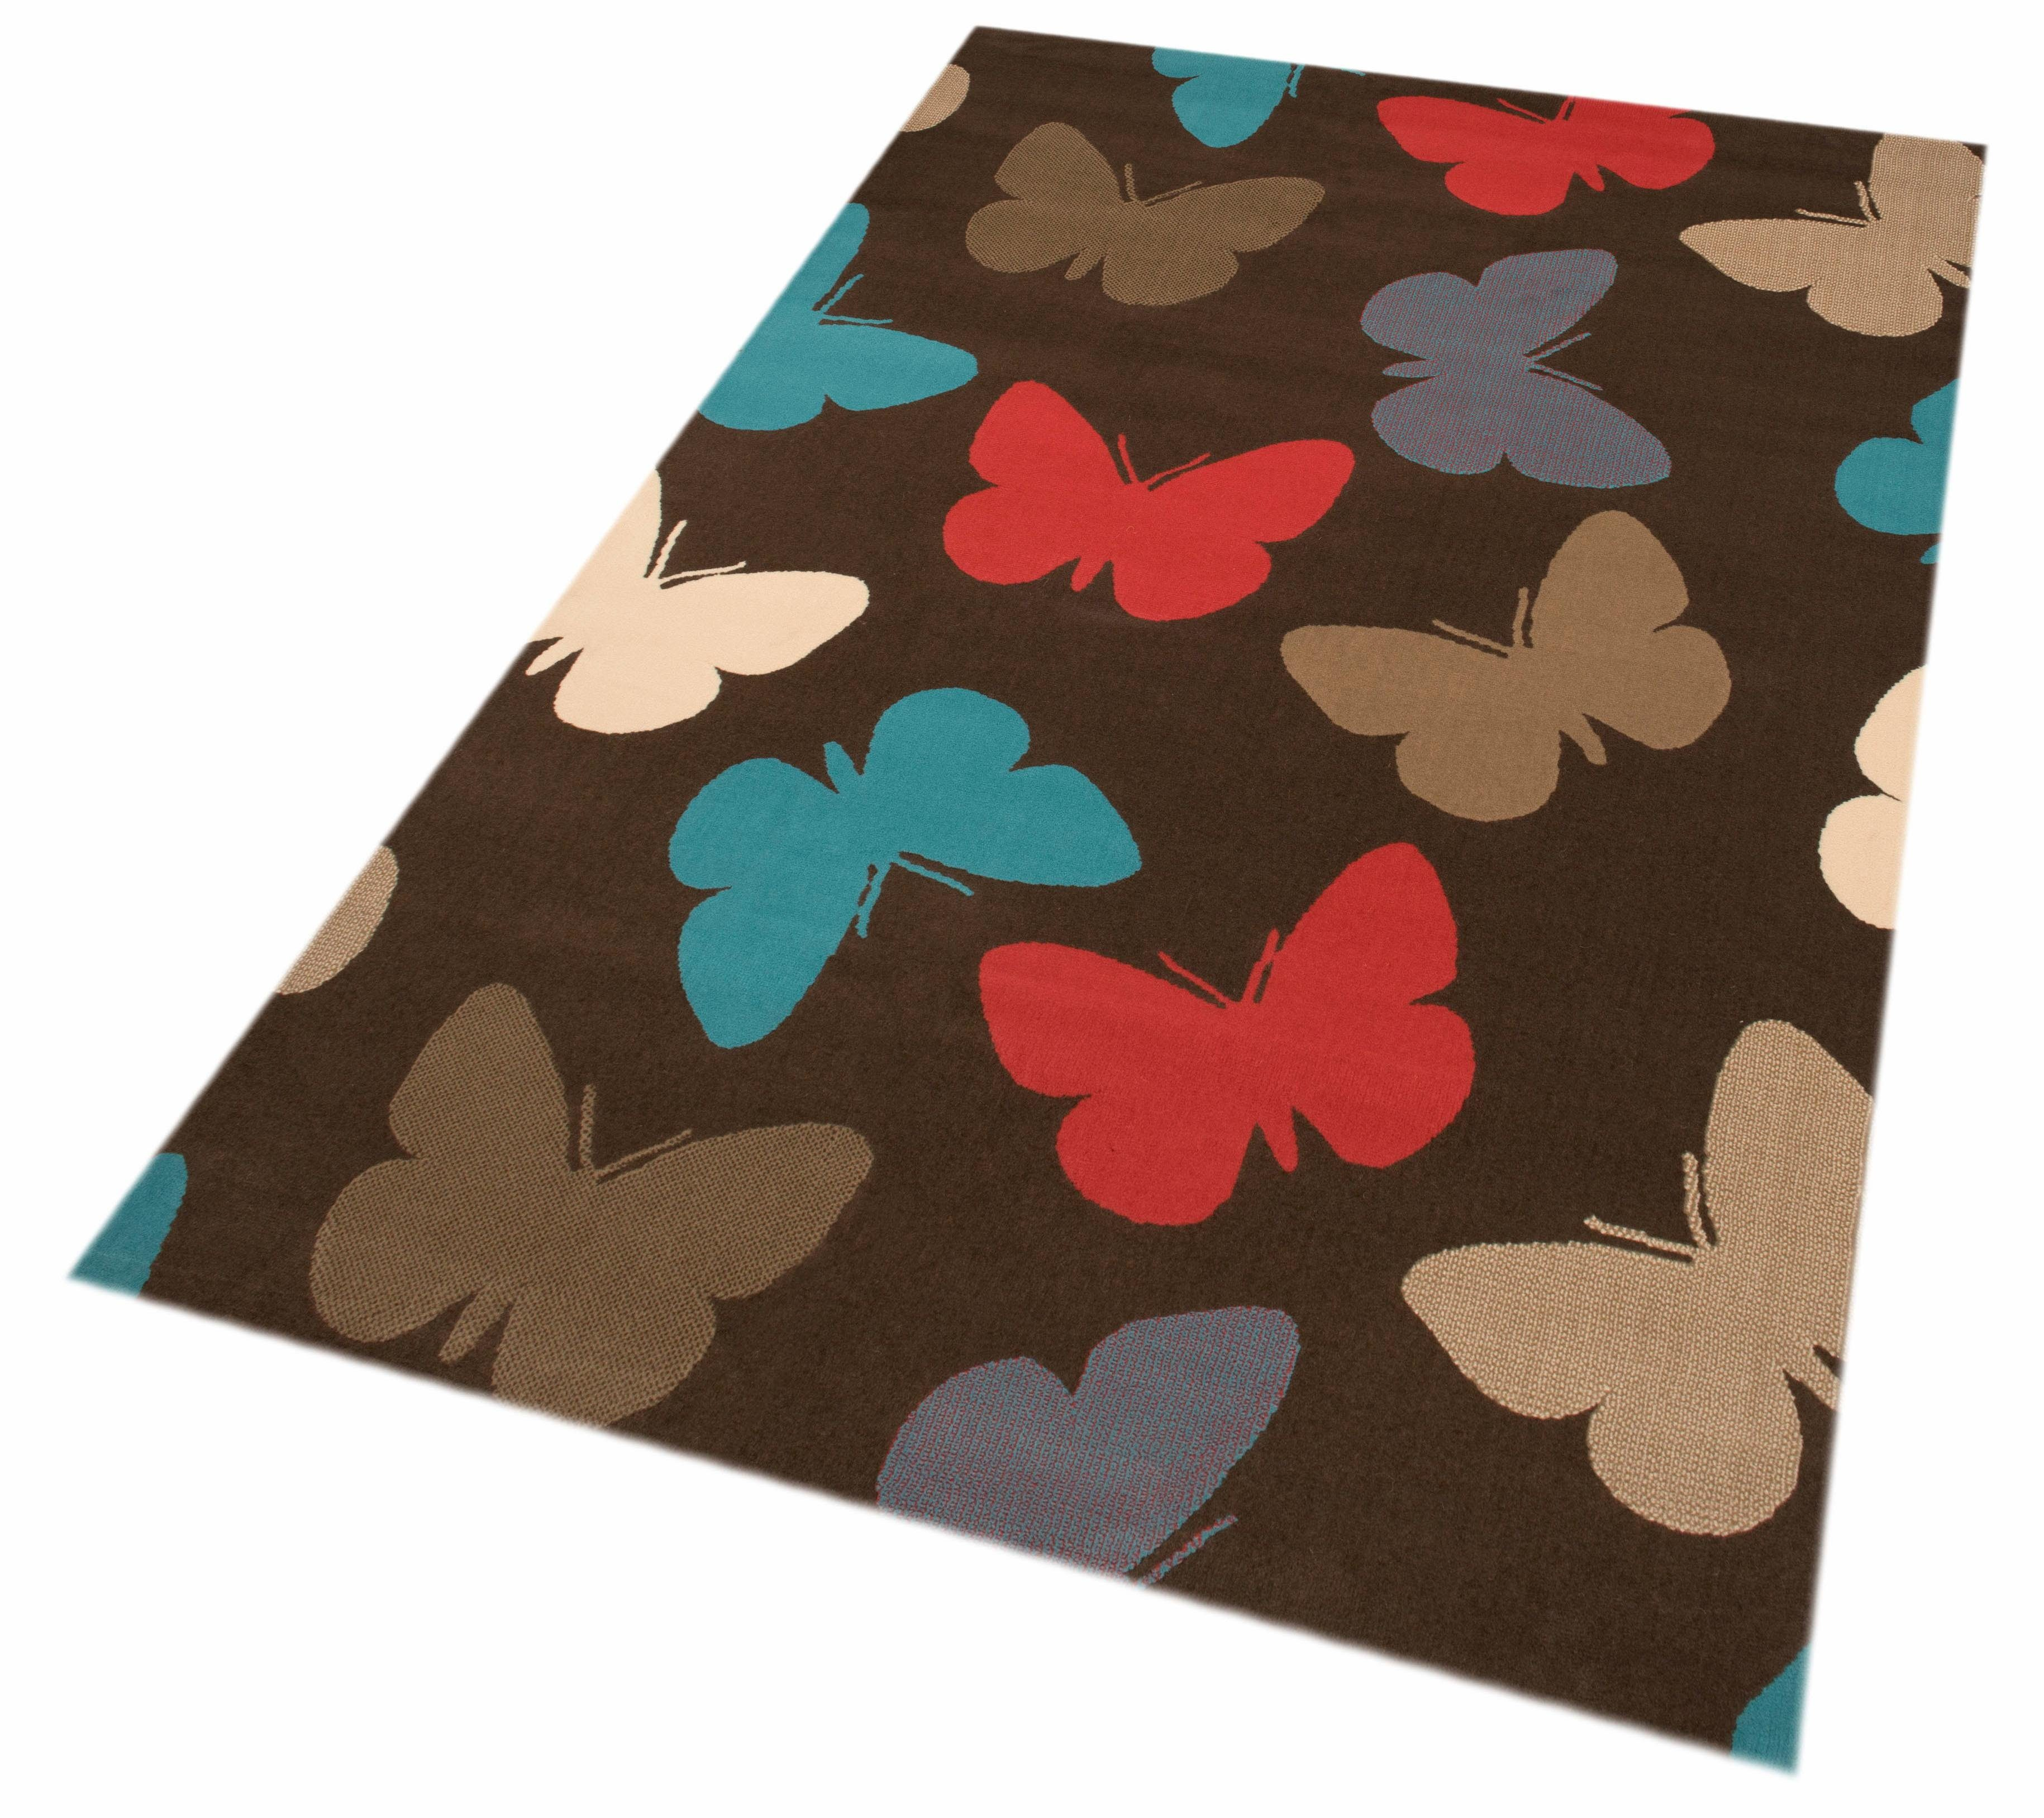 Kinderteppich »Schmetterlinge«, Zala Living, rechteckig, Höhe 9 mm